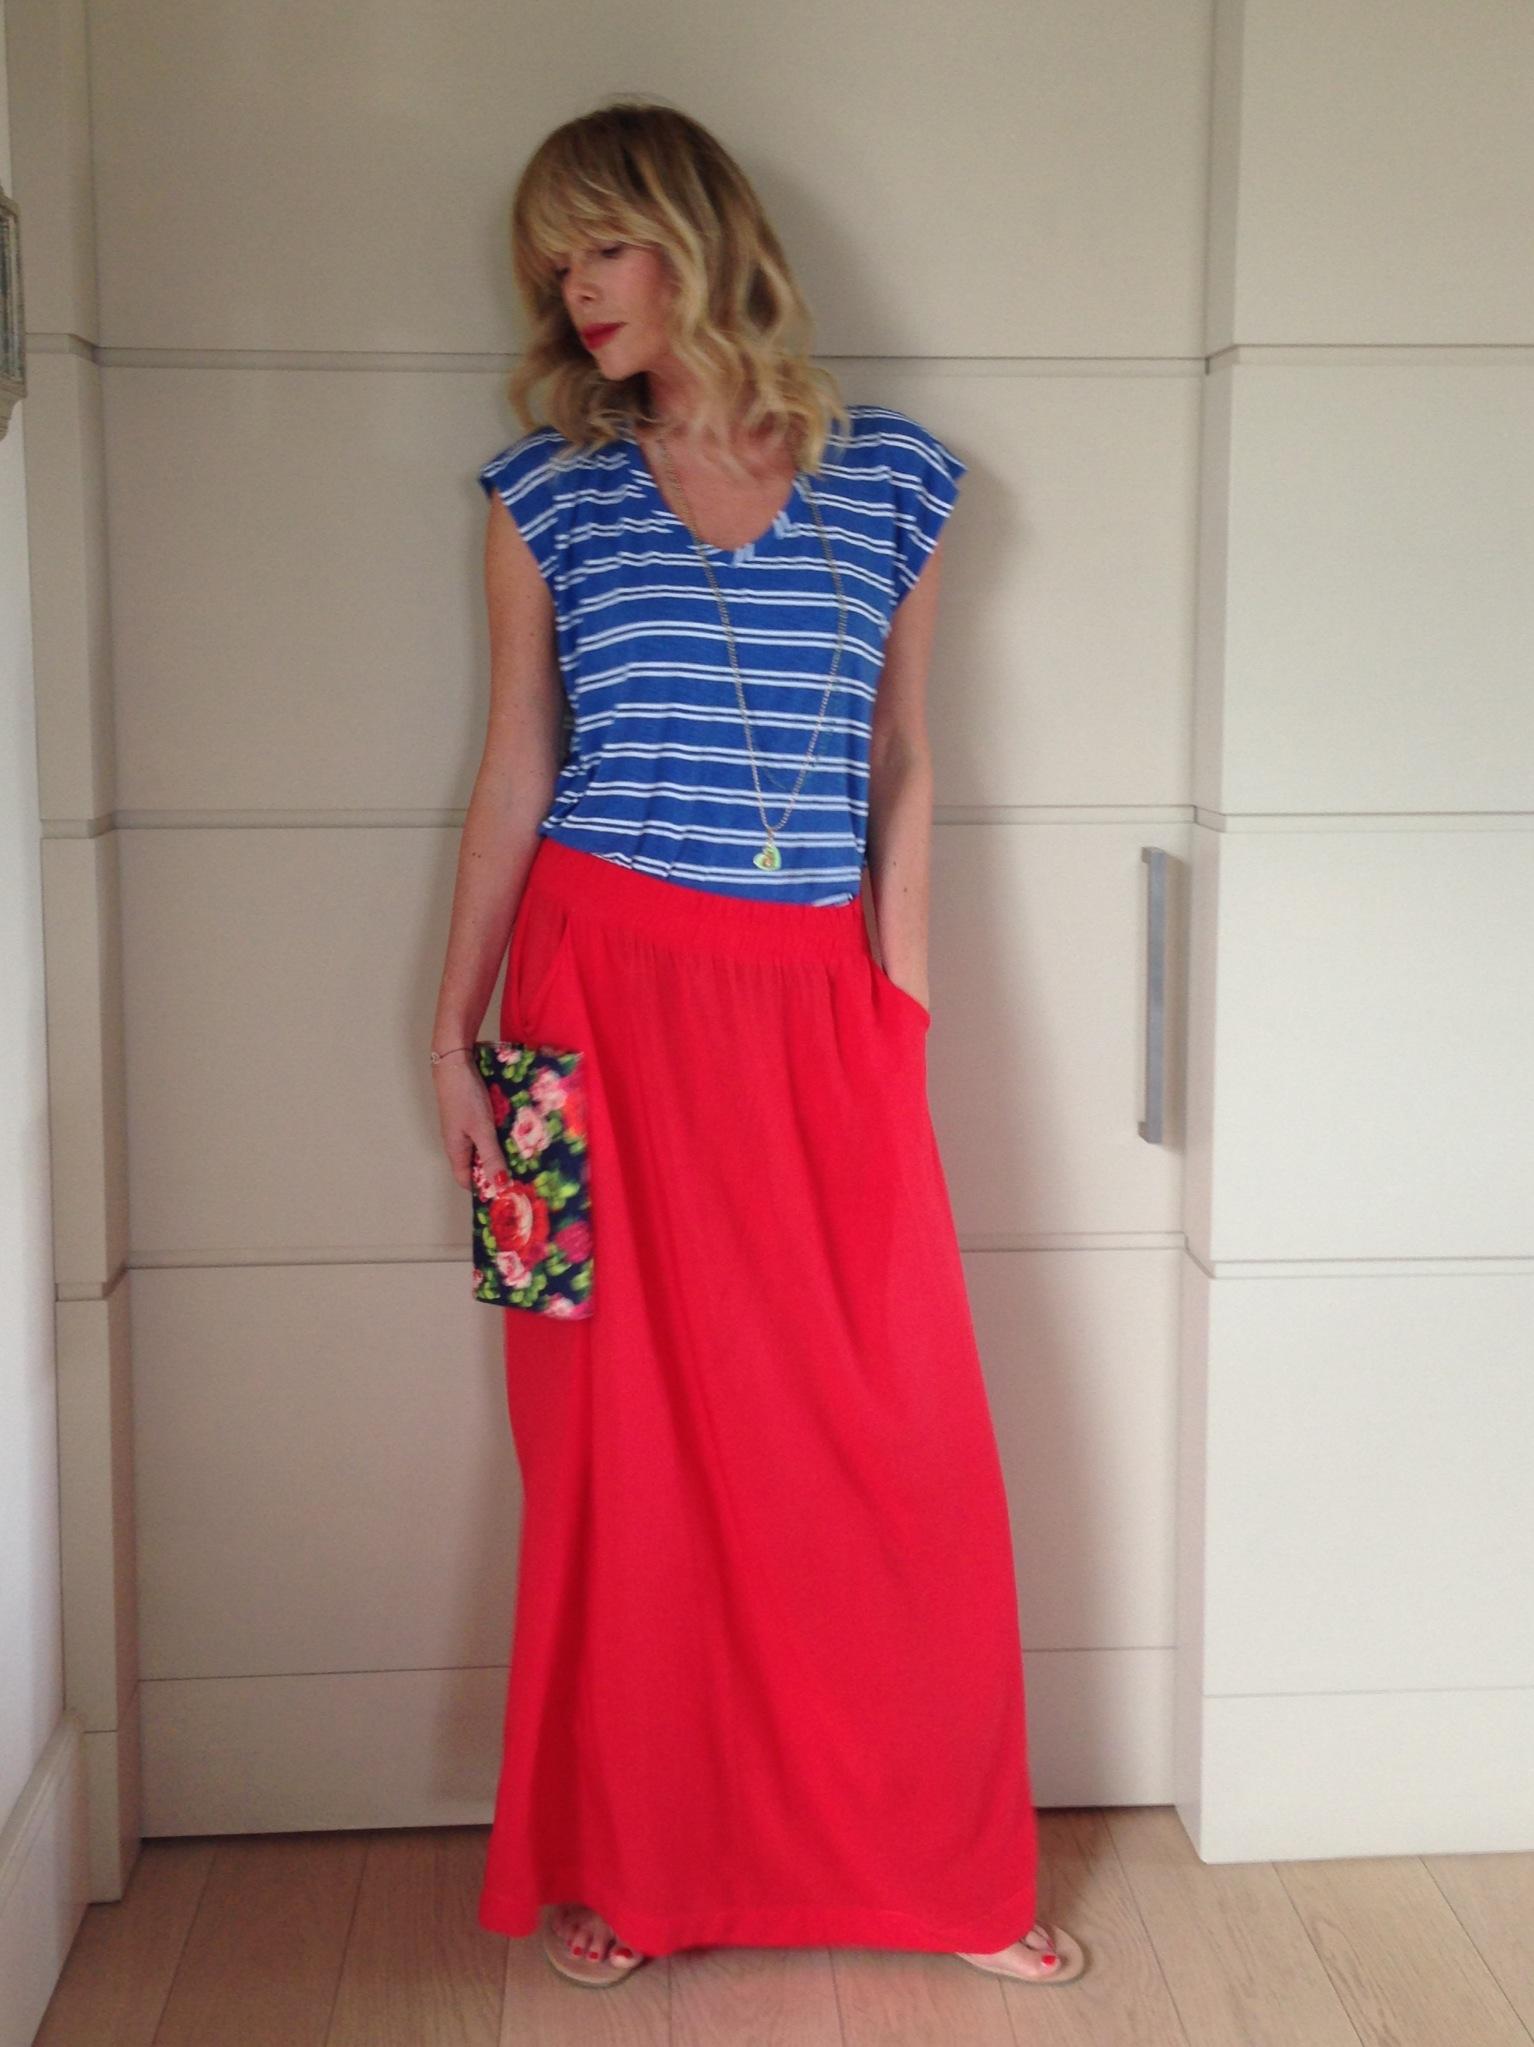 Flowers and Stripes: mix di colori, stampe e tessuti!